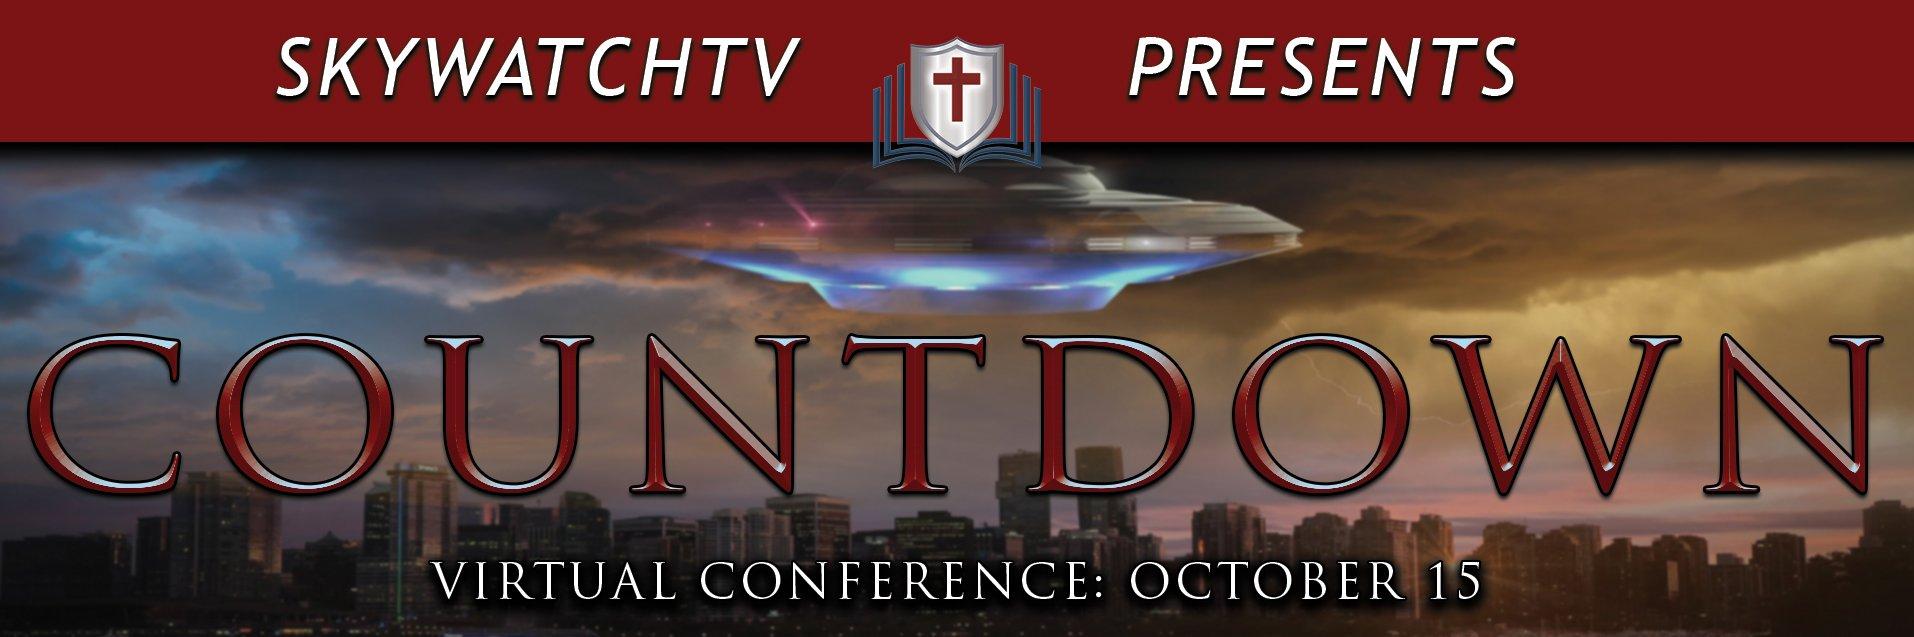 SkyWatchTV's Defender Conference